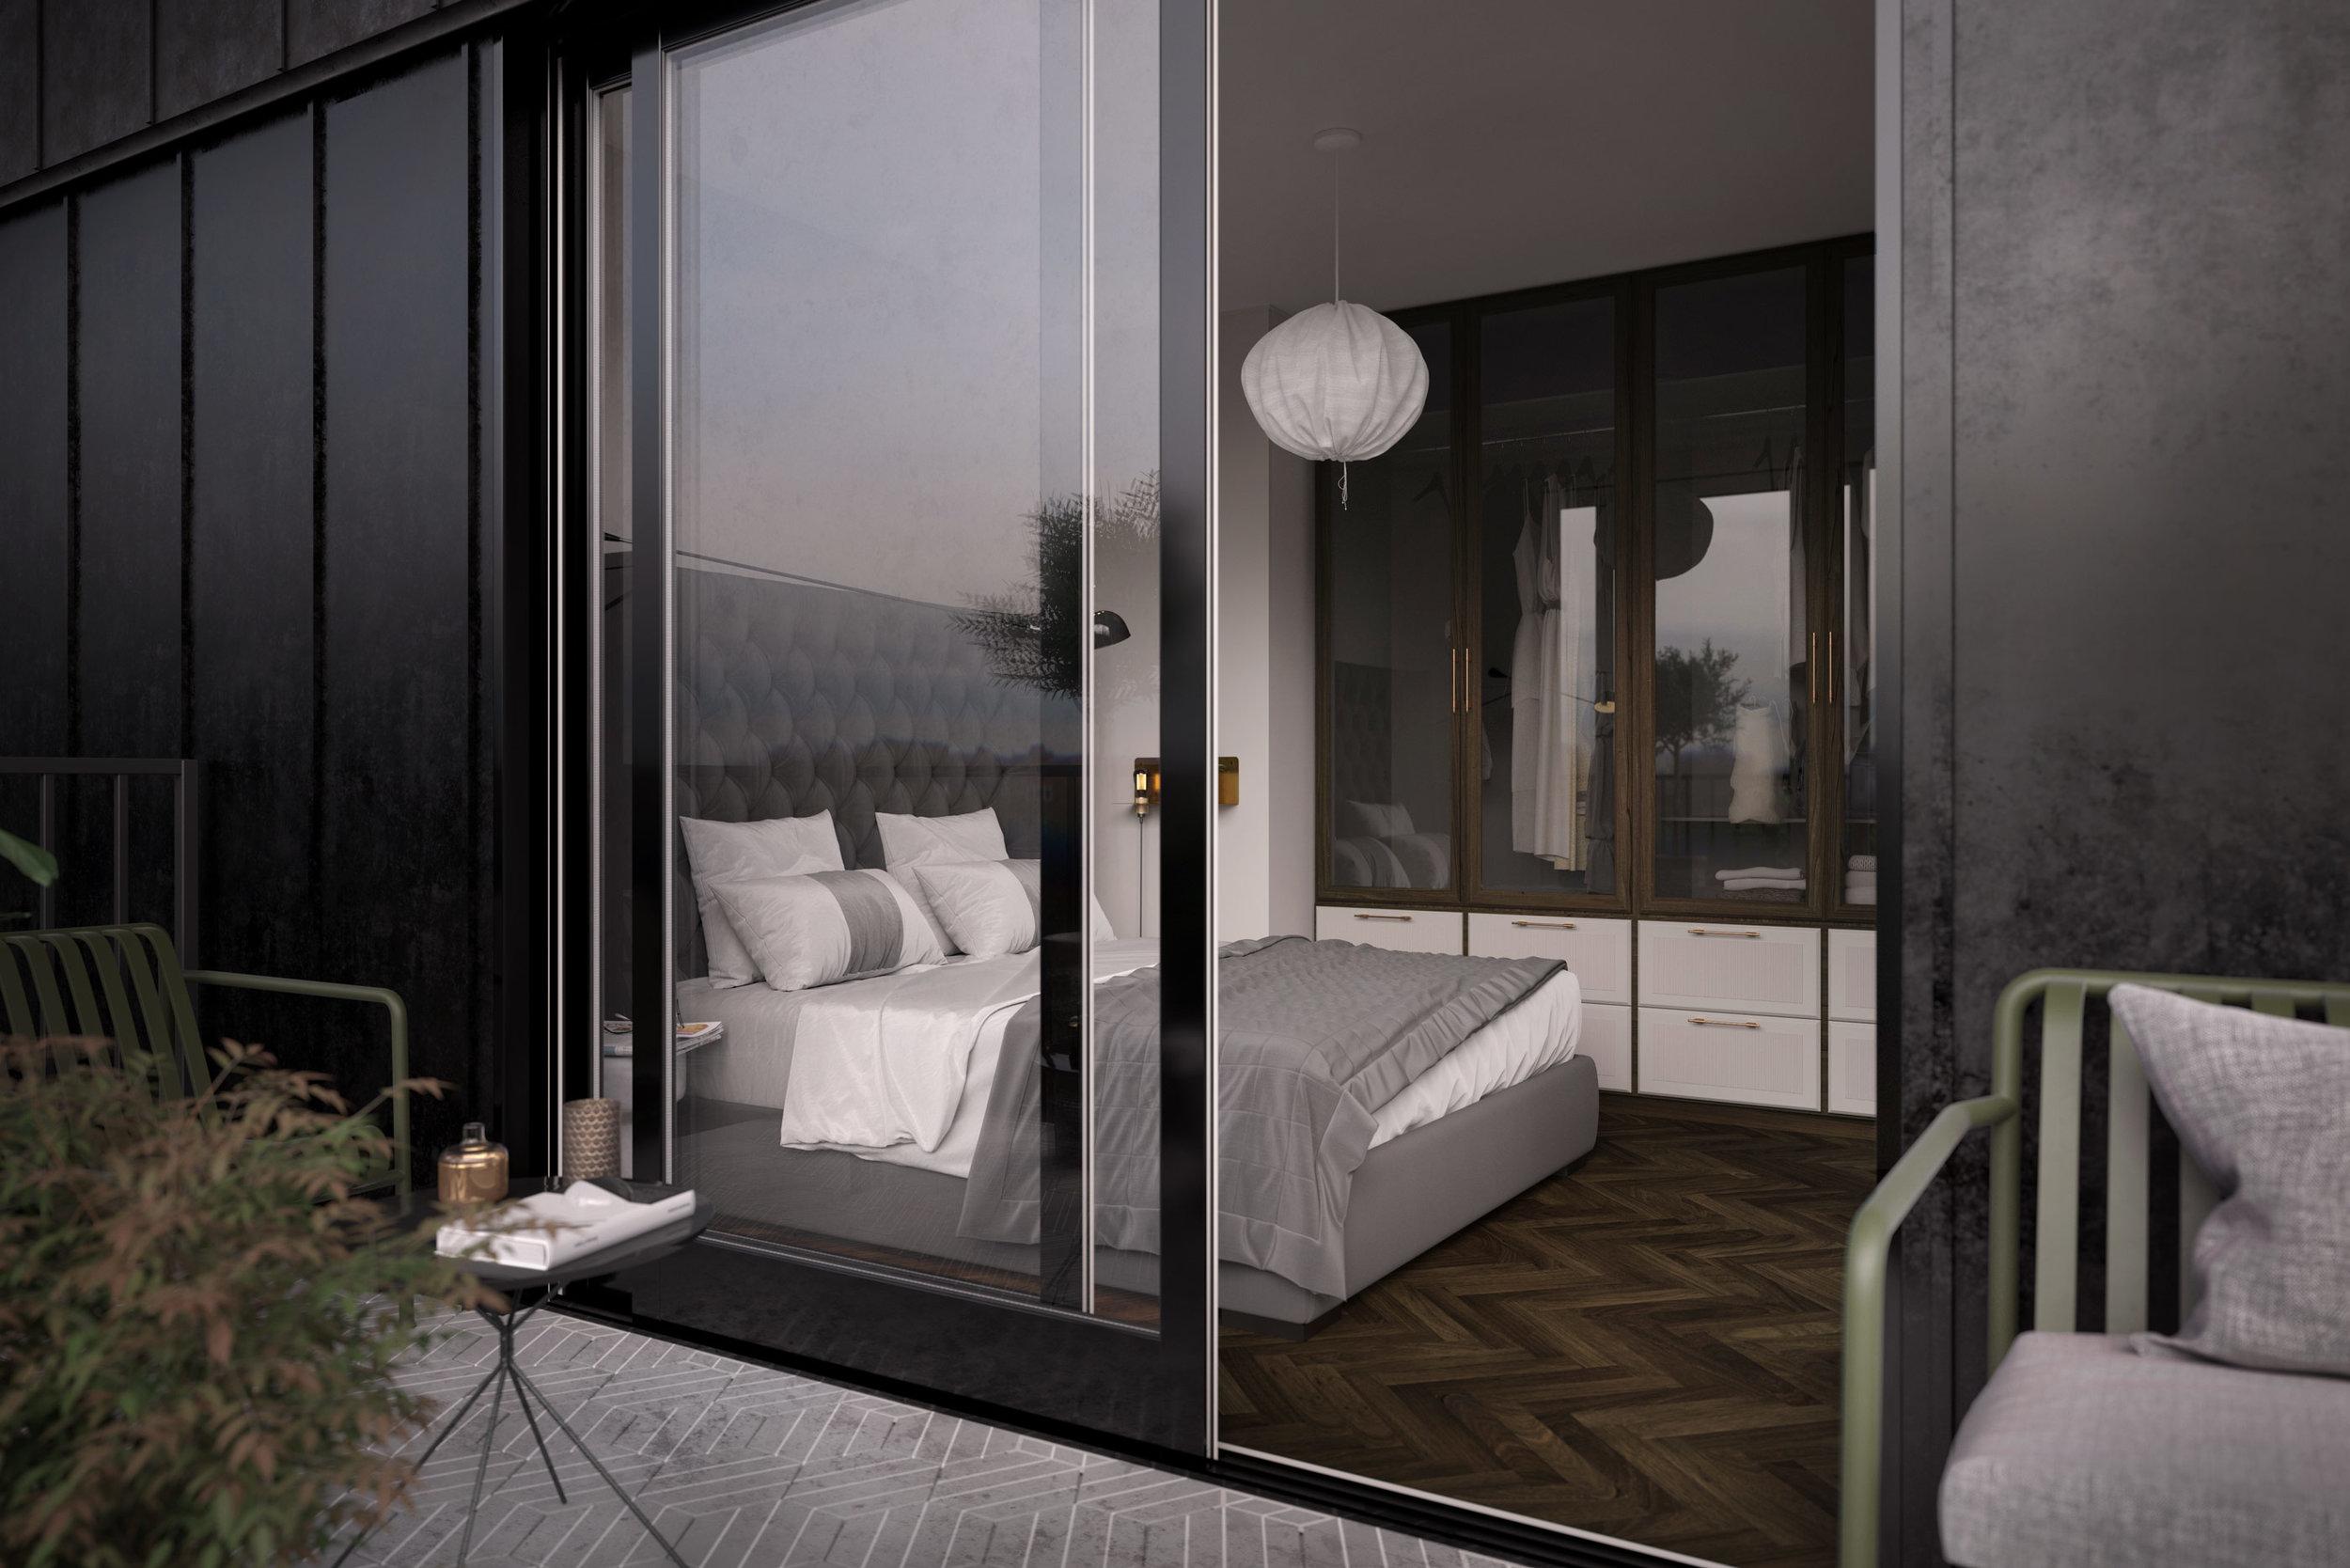 Lenca_Nocks_Bedroom_01.jpg